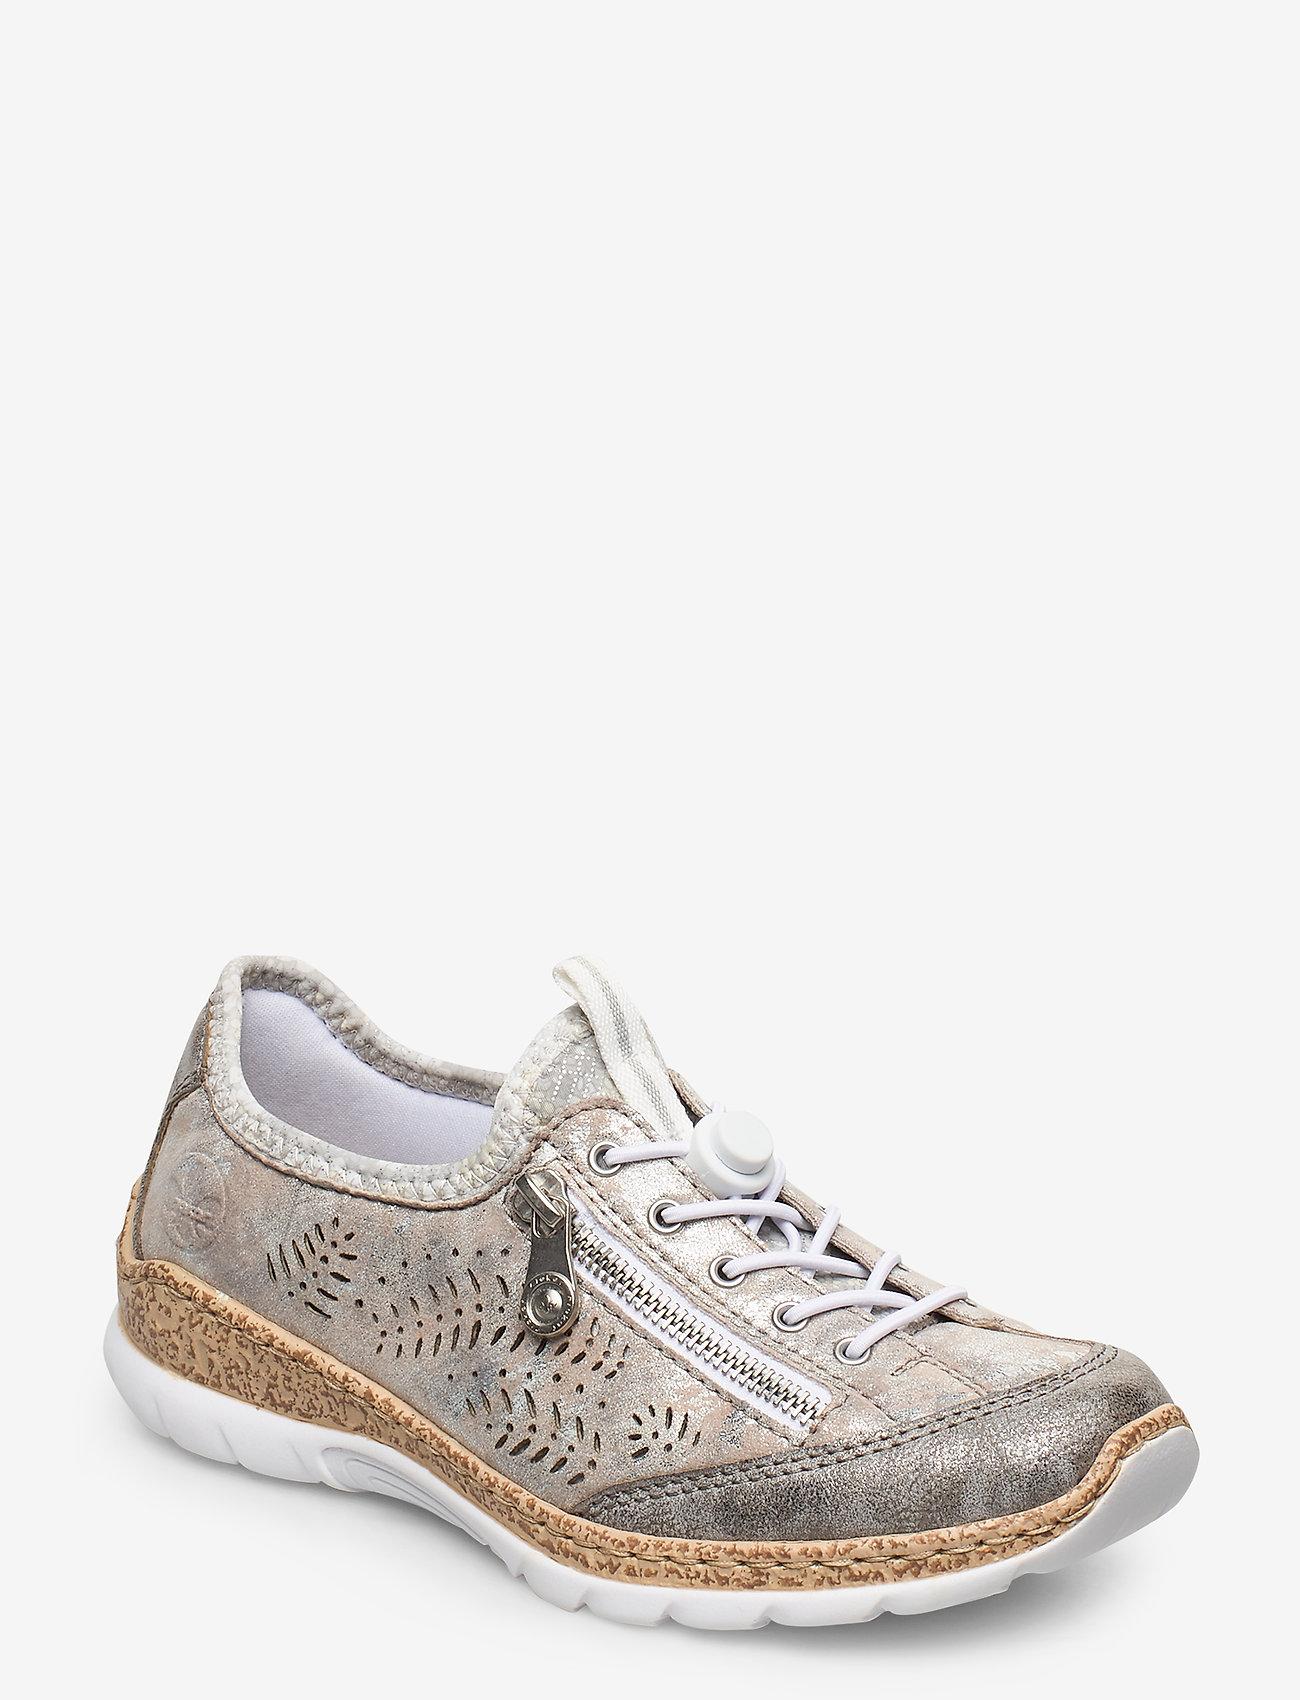 Rieker - N42K6-40 - low top sneakers - grey combination